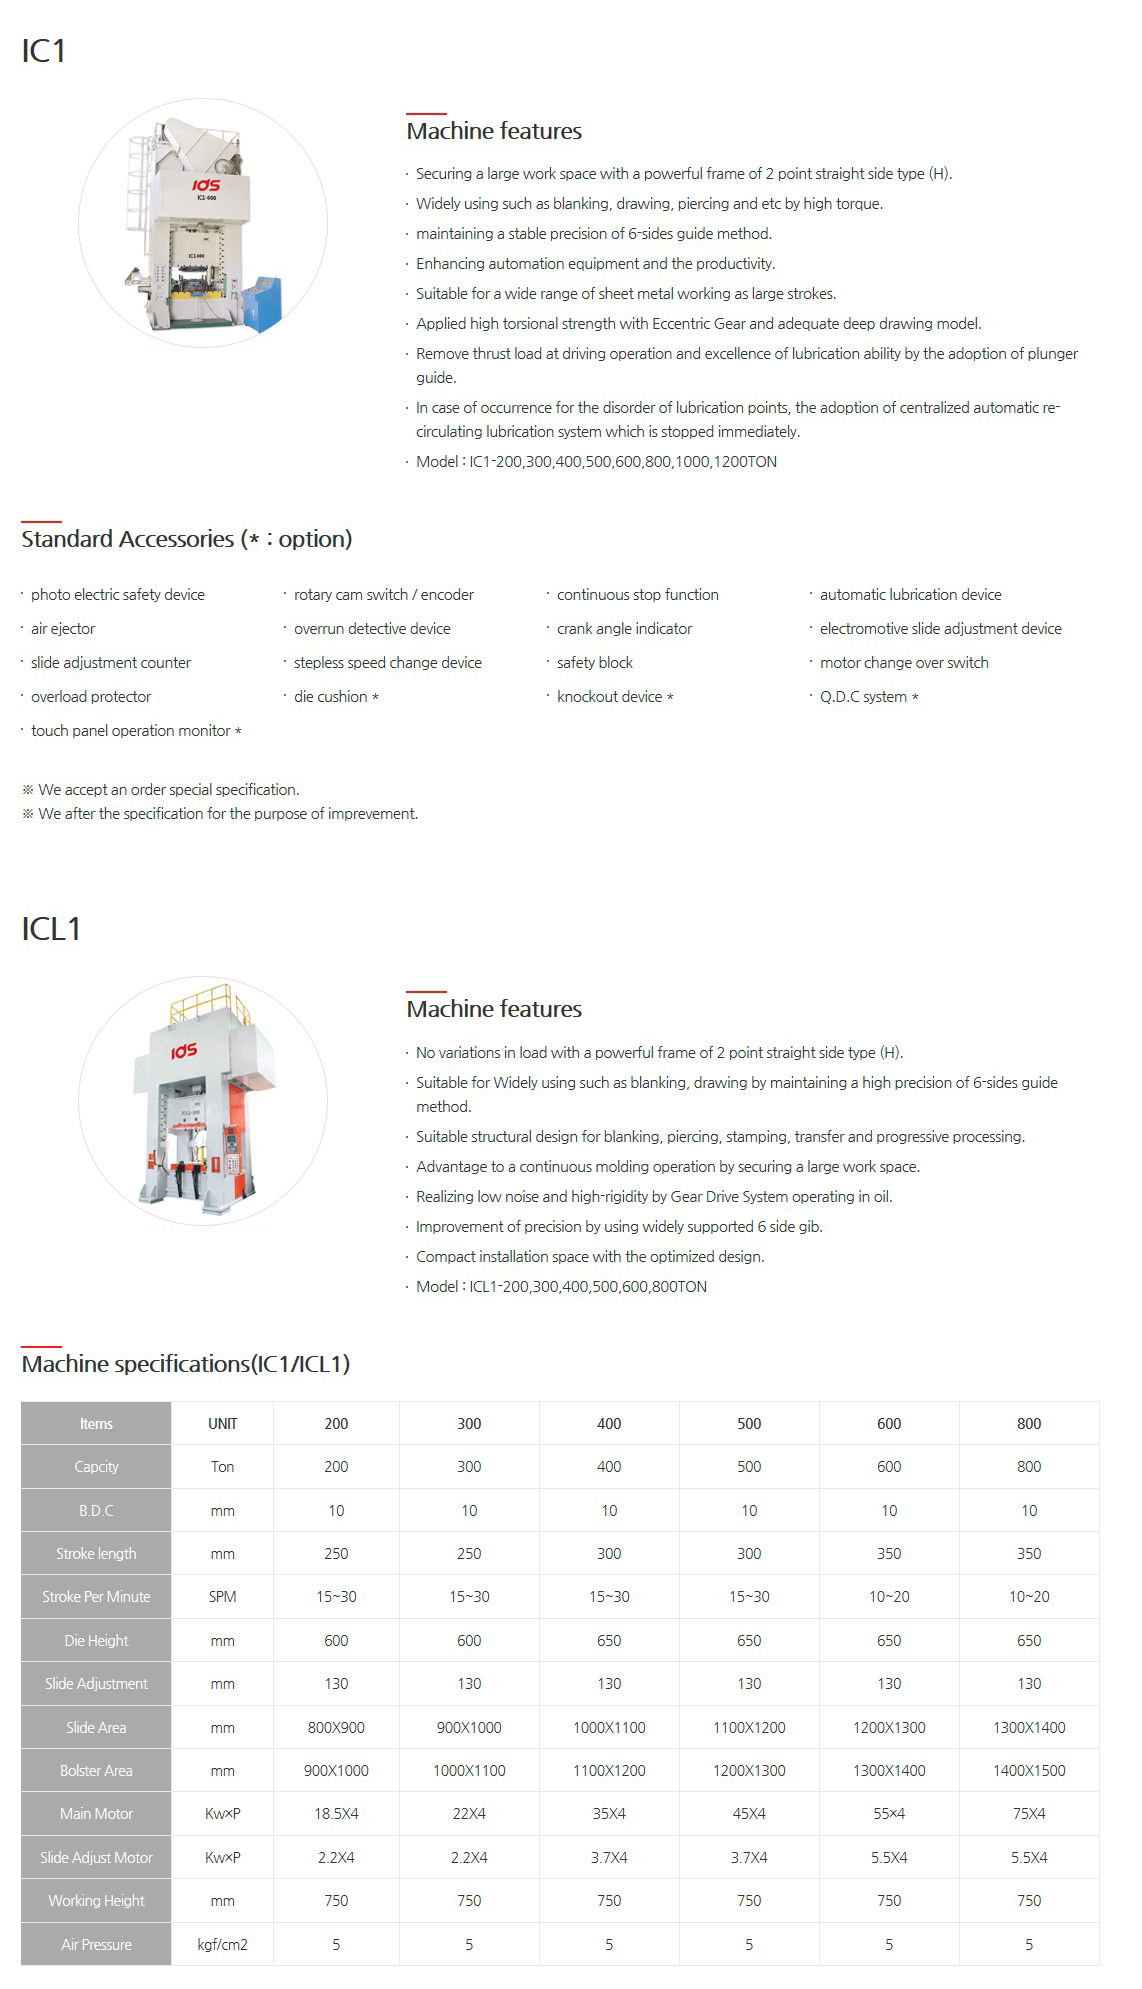 IDS PRESS Mechanical Presses (H-Type Press) IC1, ICL1